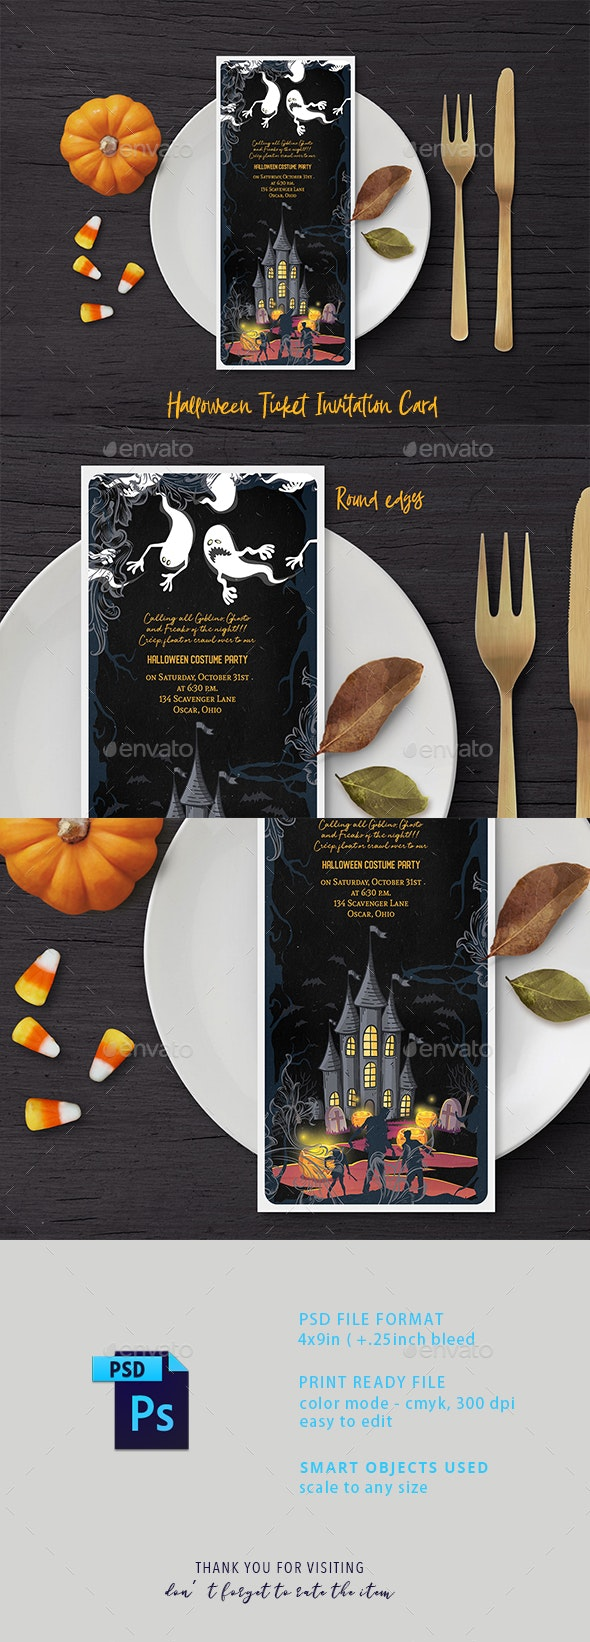 Halloween Ticket Invitation Card - Cards & Invites Print Templates